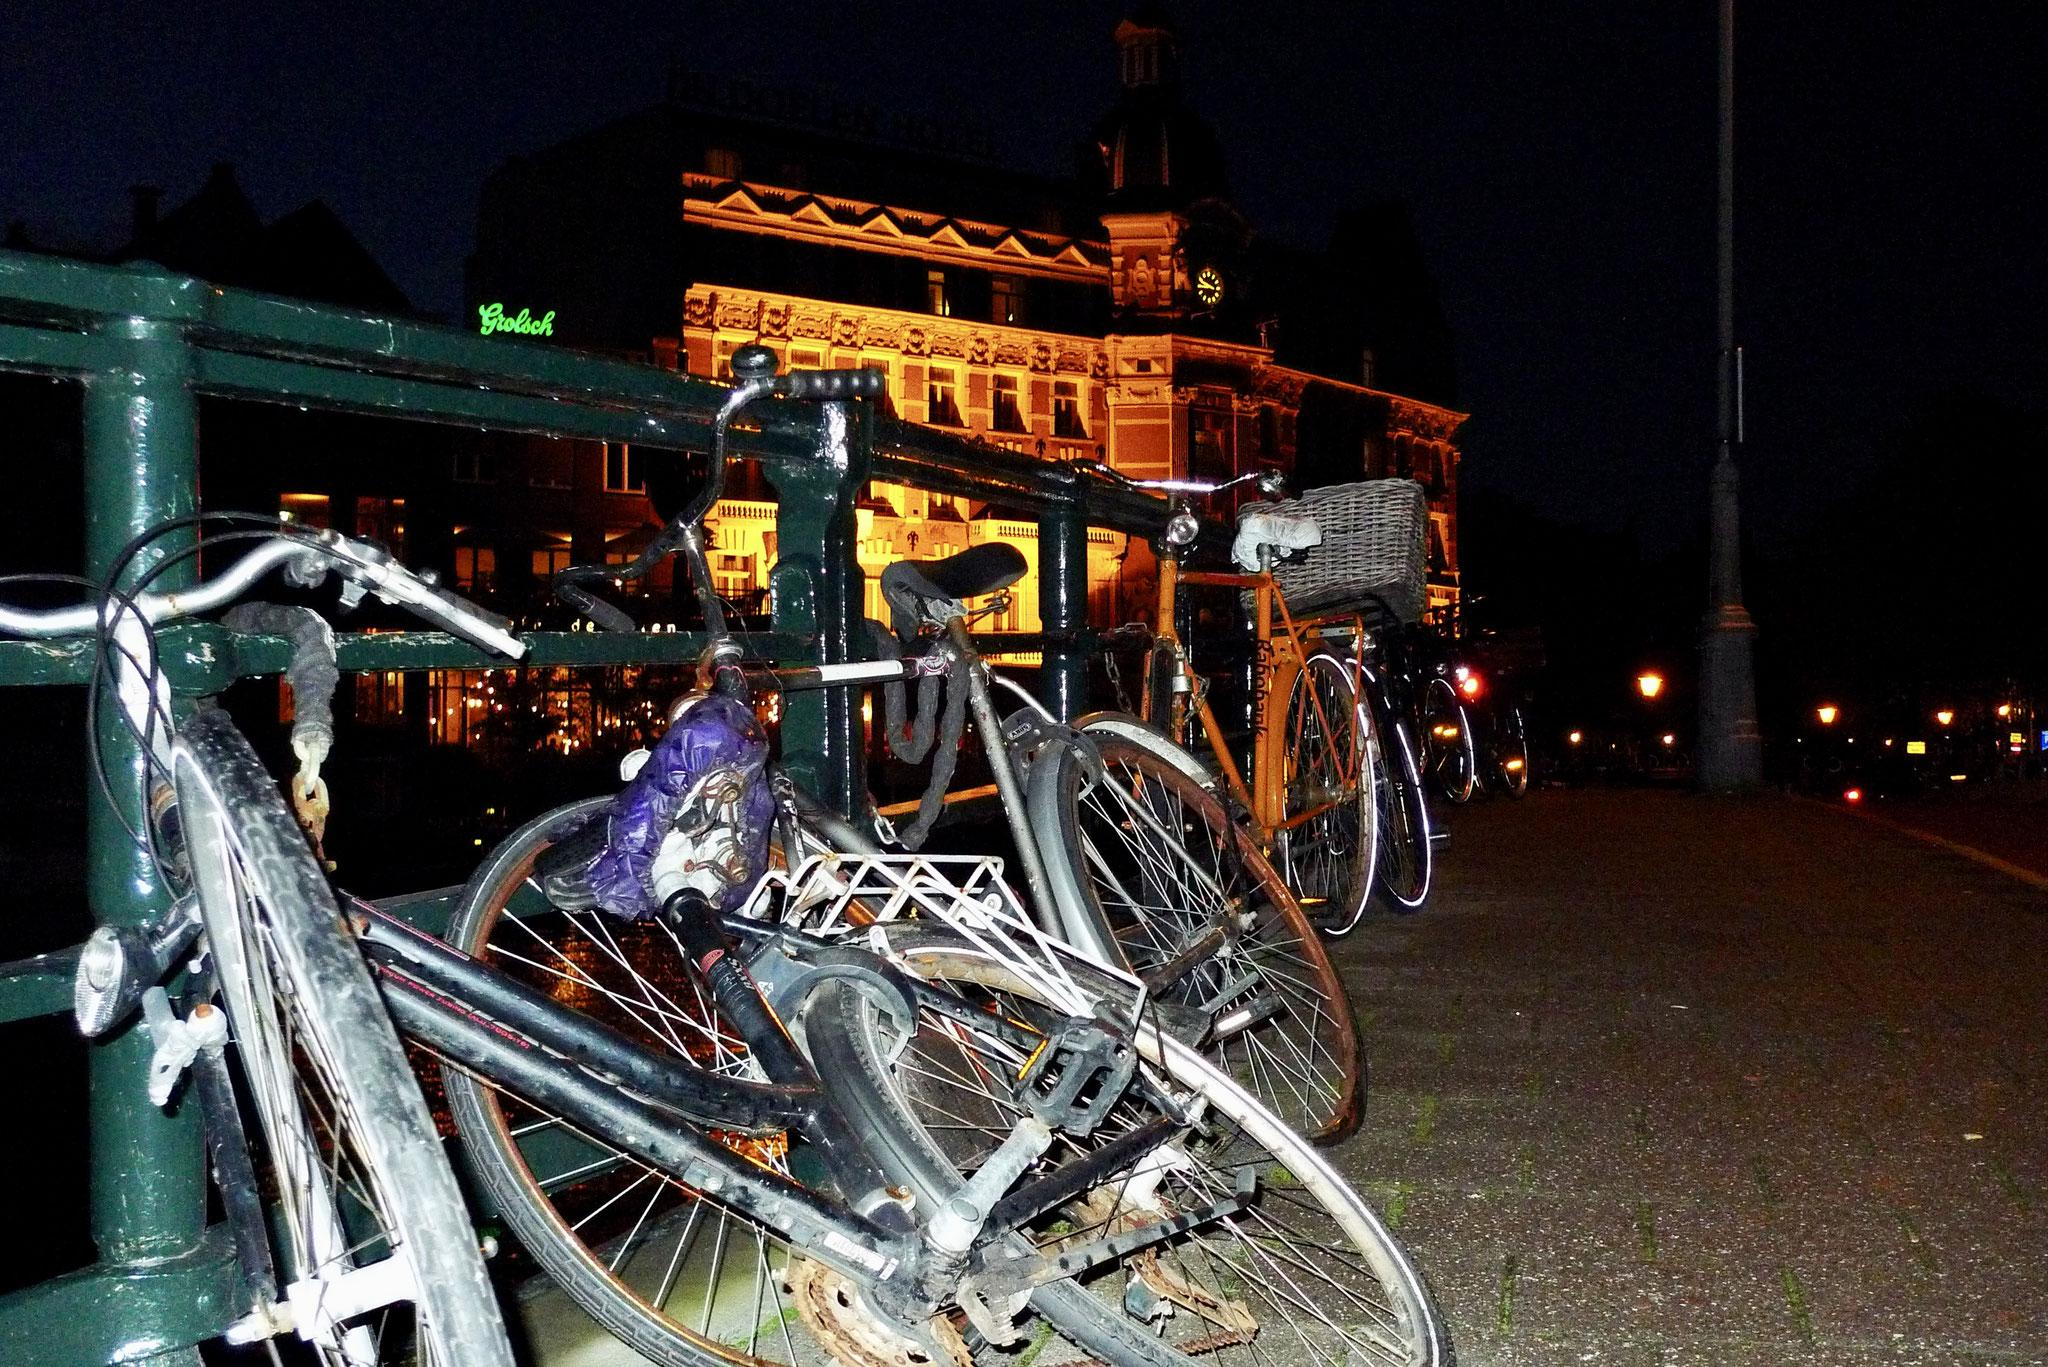 More Amsterdam bikes